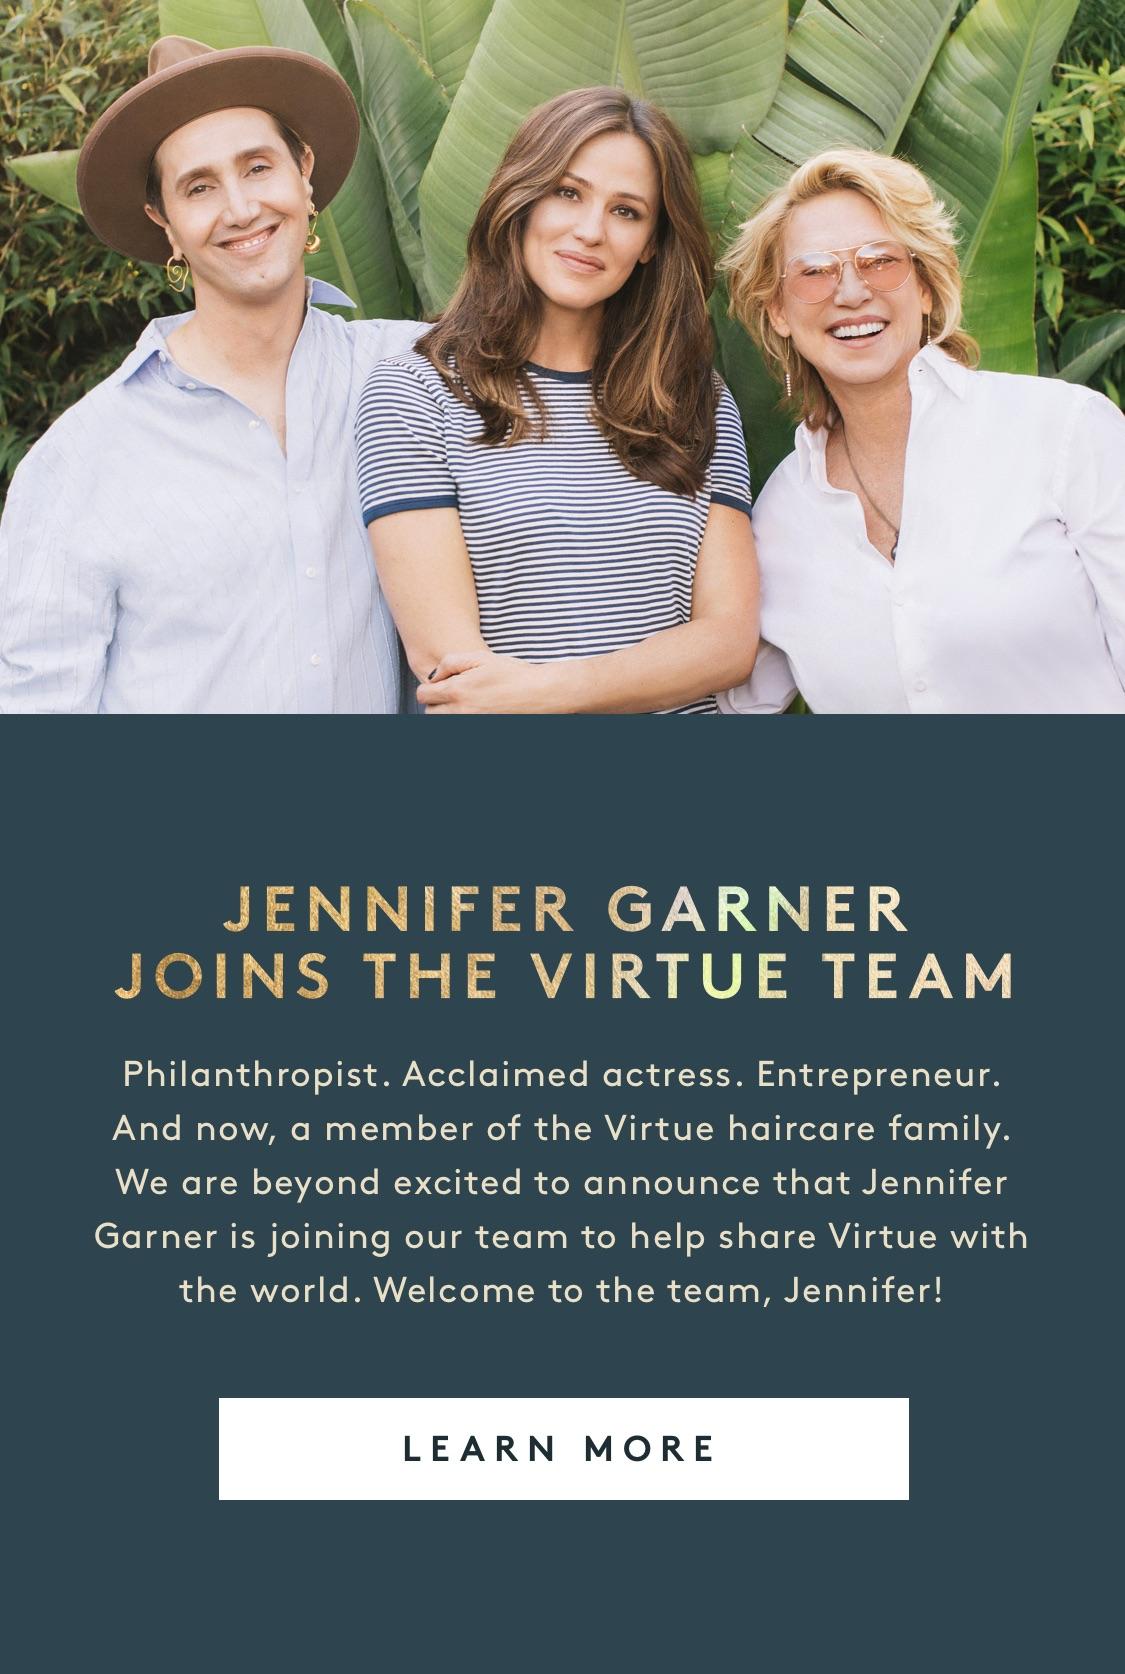 Jennifer Garner Joins the Virtue Team